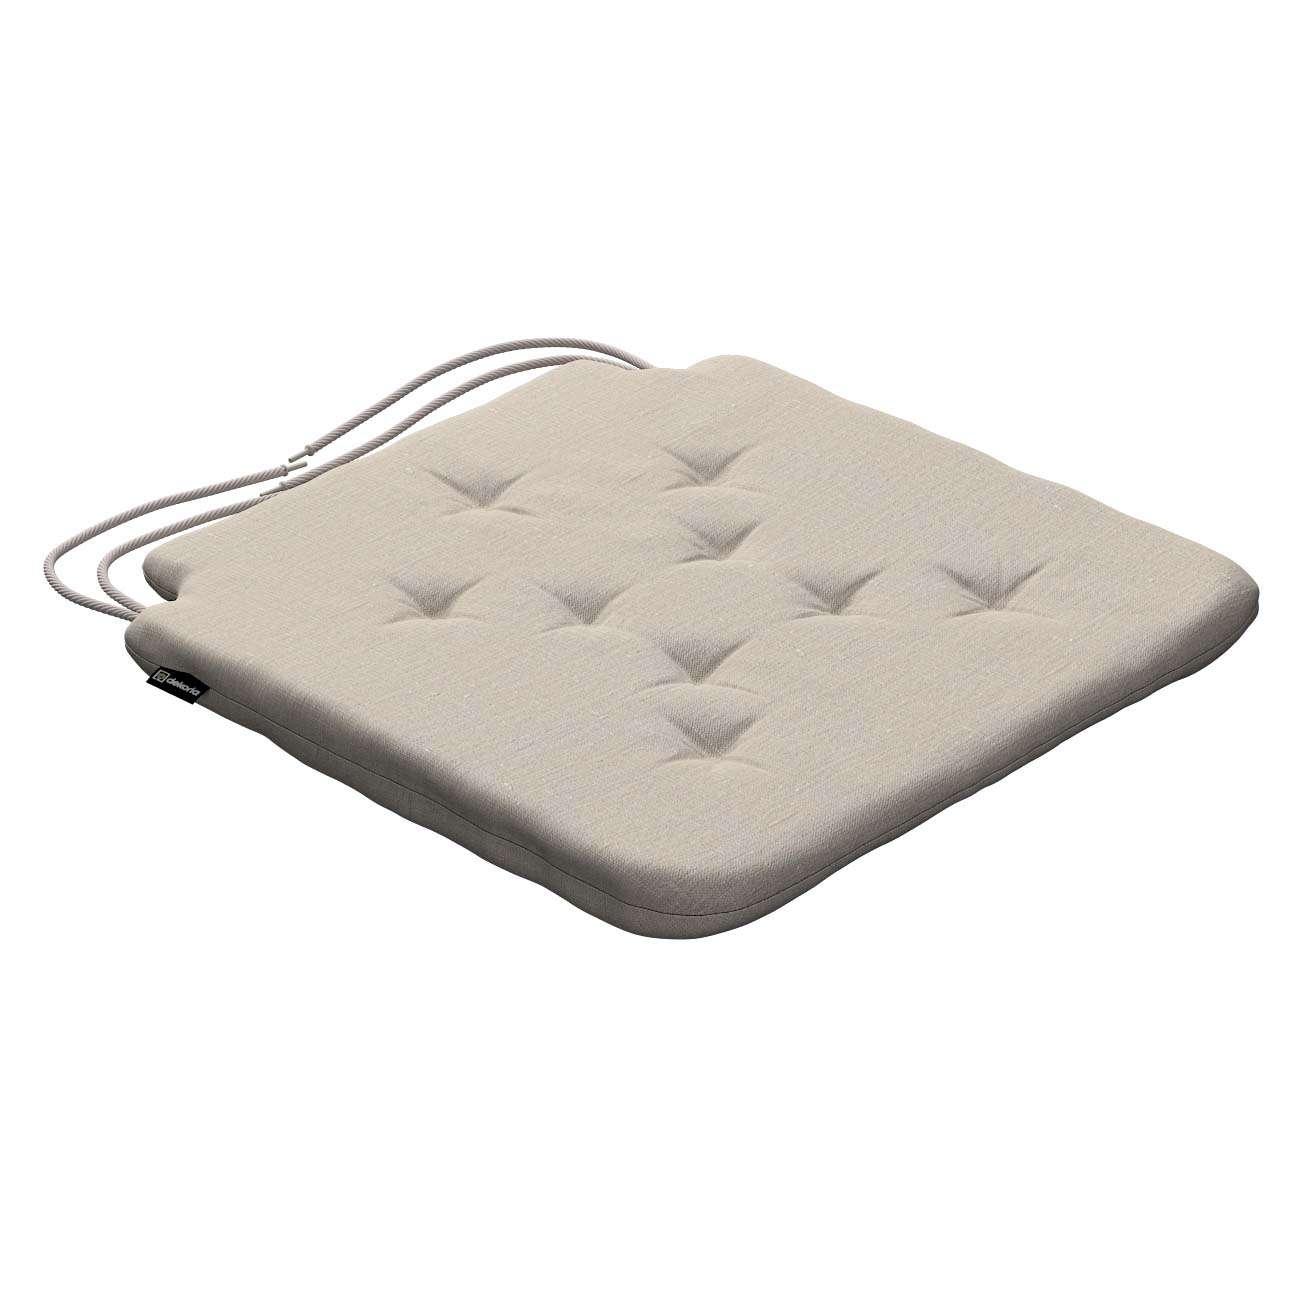 Kėdės pagalvėlė Olek  42 x 41 x 3,5 cm kolekcijoje Linen , audinys: 392-05